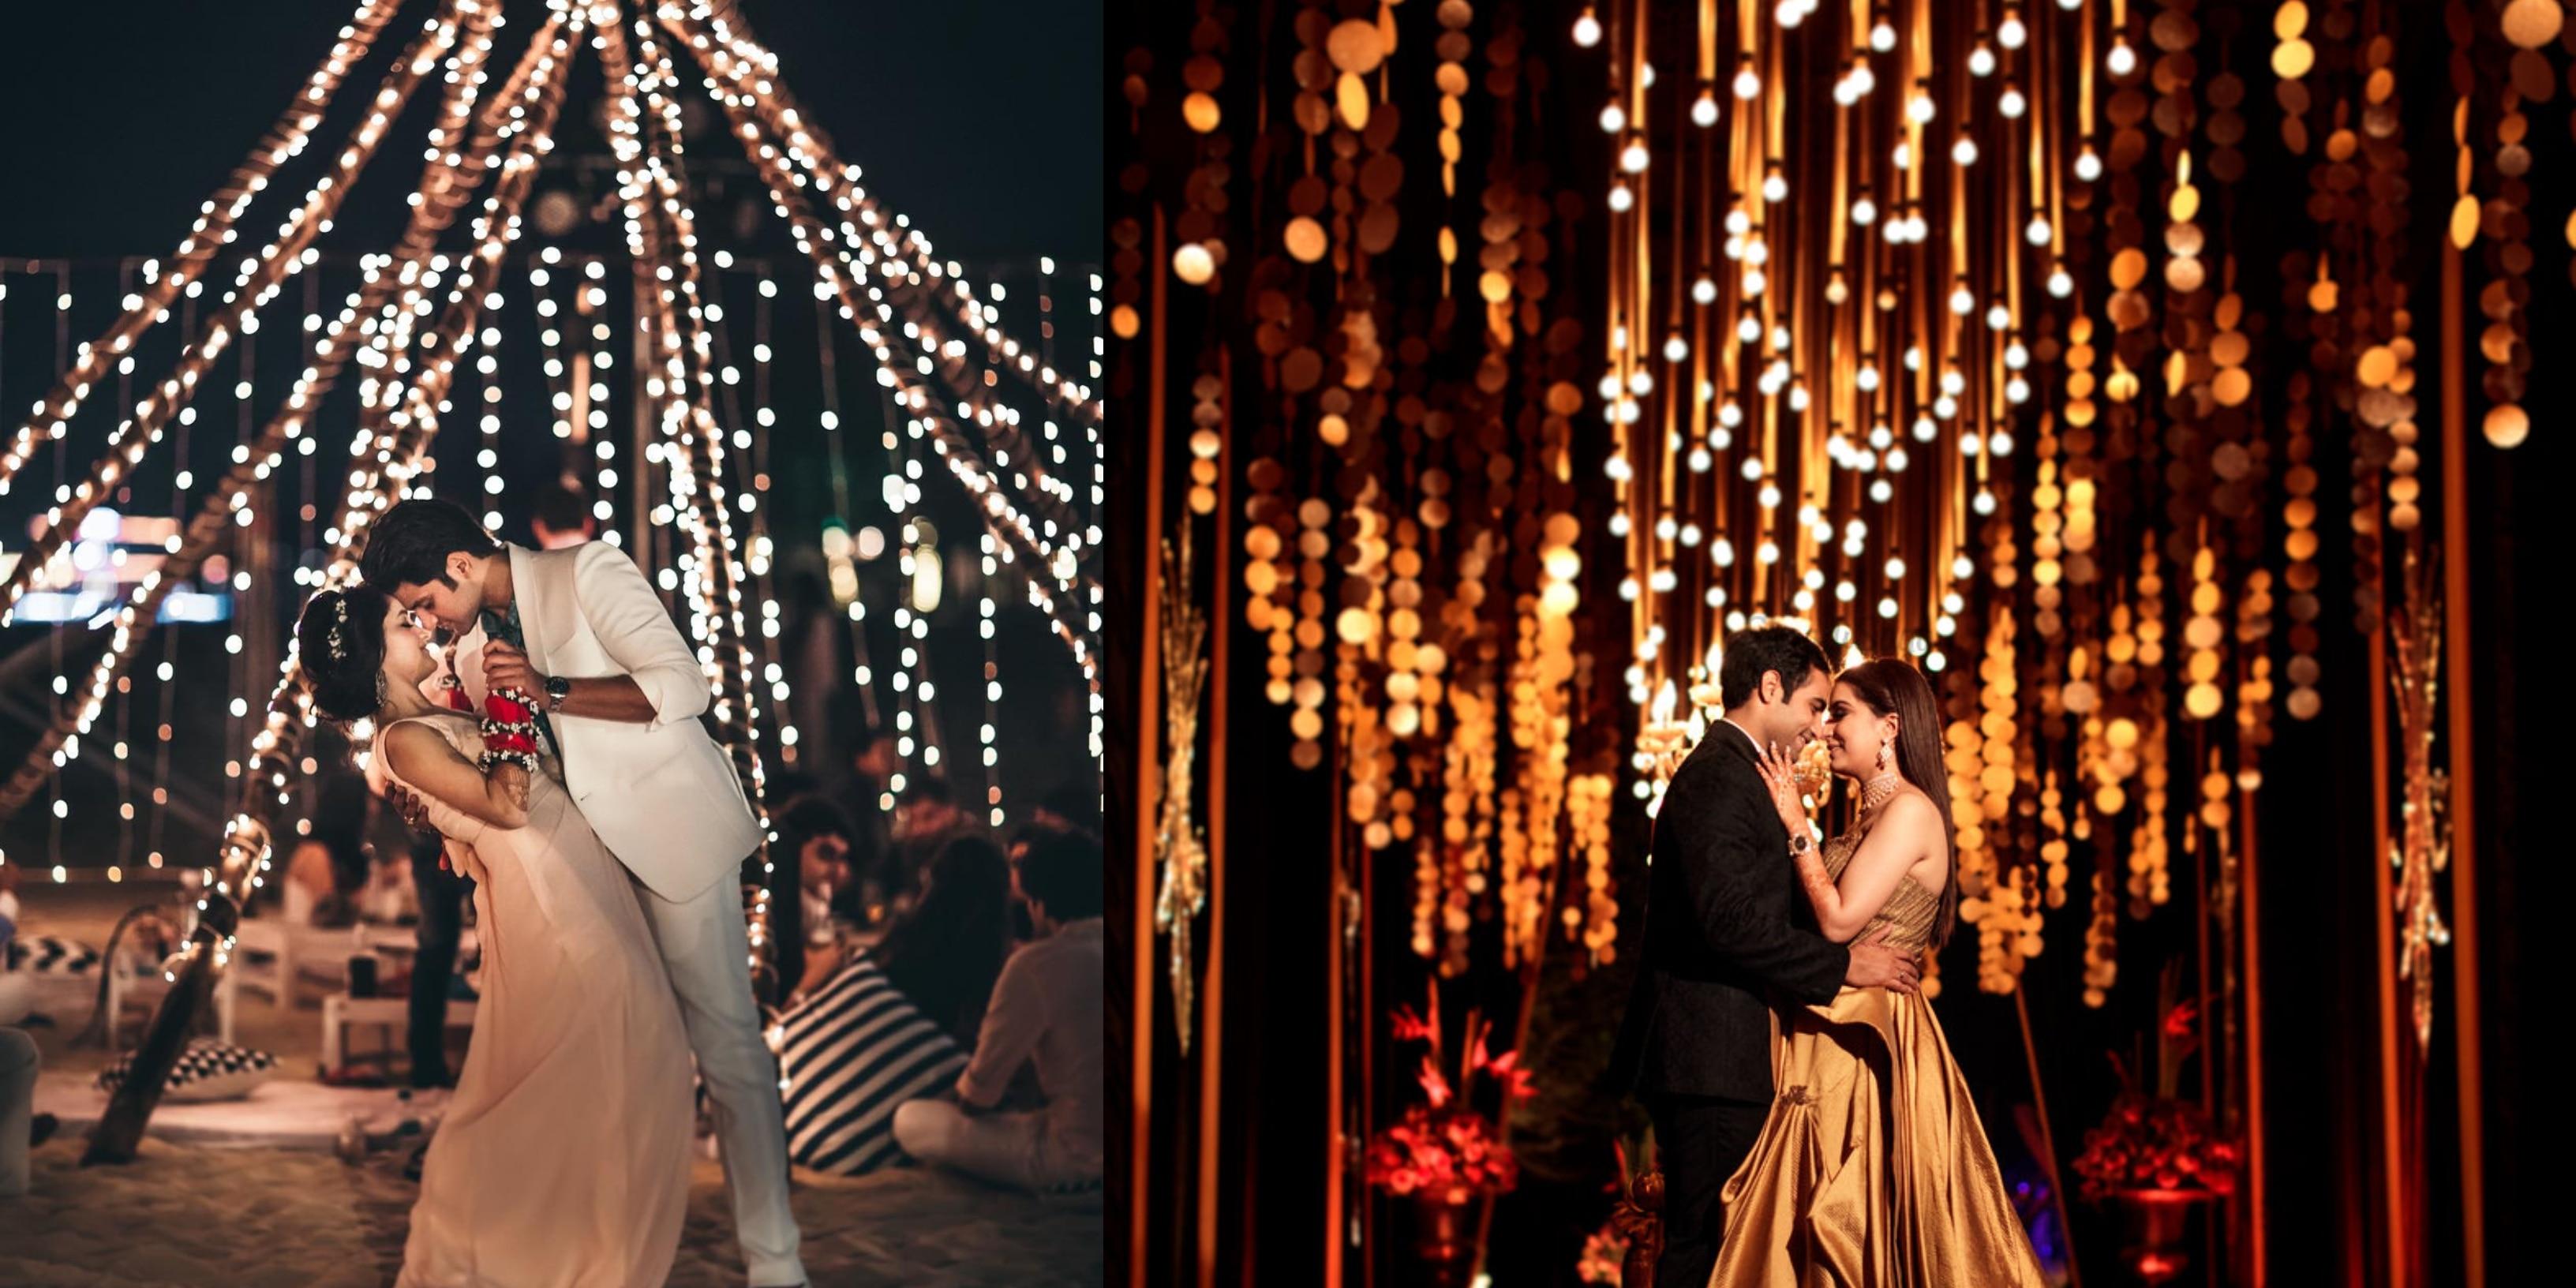 16 Wedding Decor Ideas With Fairy Lights Bulbs Are Sure To